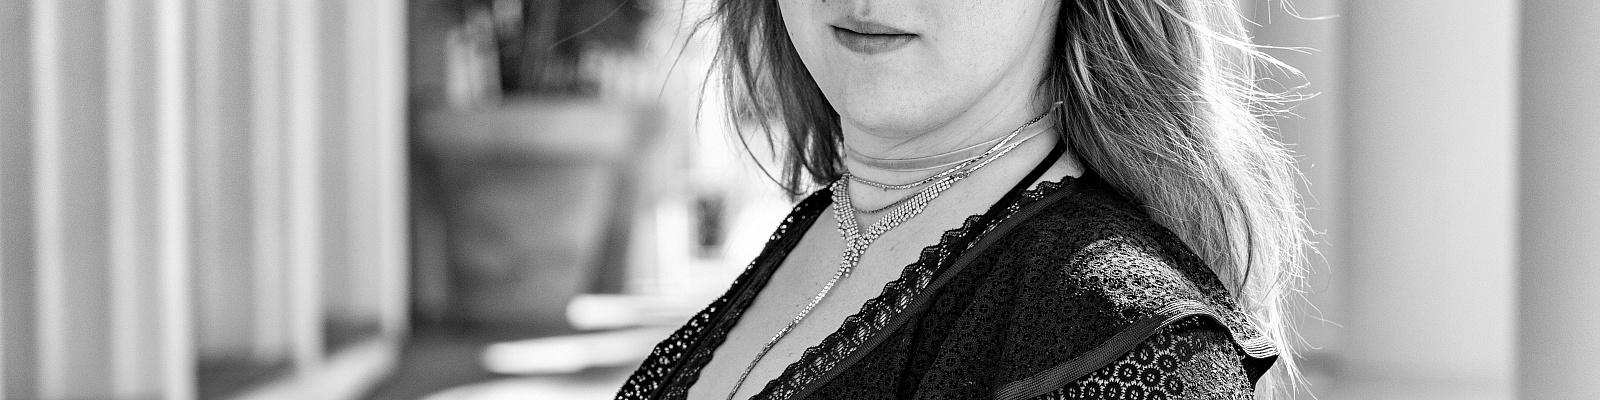 Natalie Patterson's Cover Photo